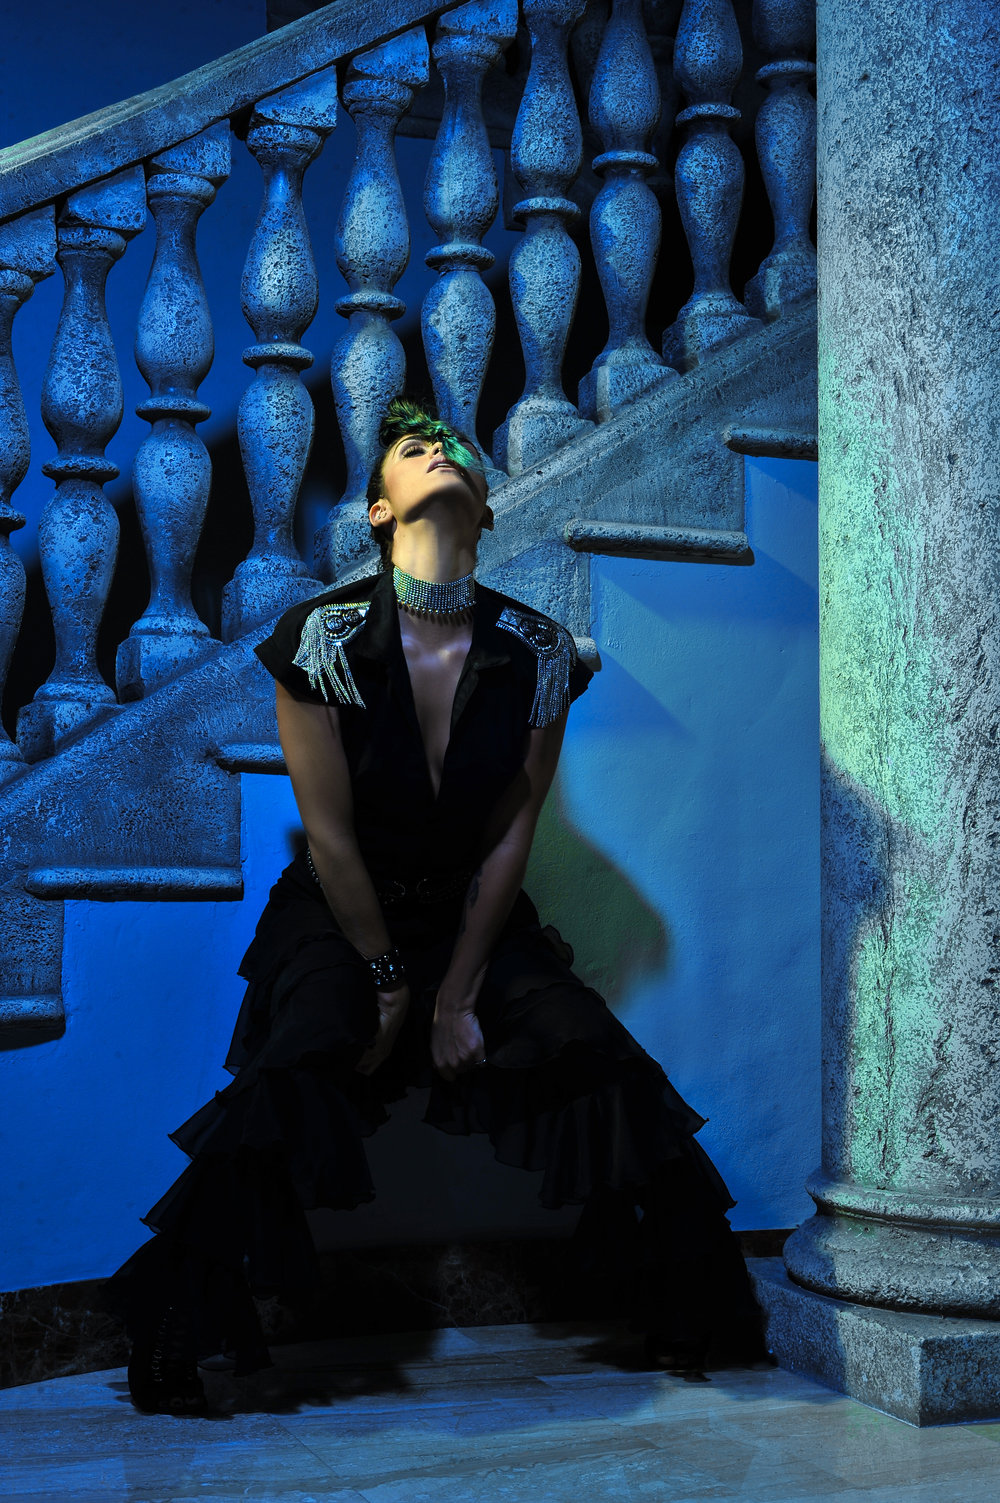 model-beefiyaa-art-crazy-photo-g-photography-fashion-stylist-illy-perez2.JPG